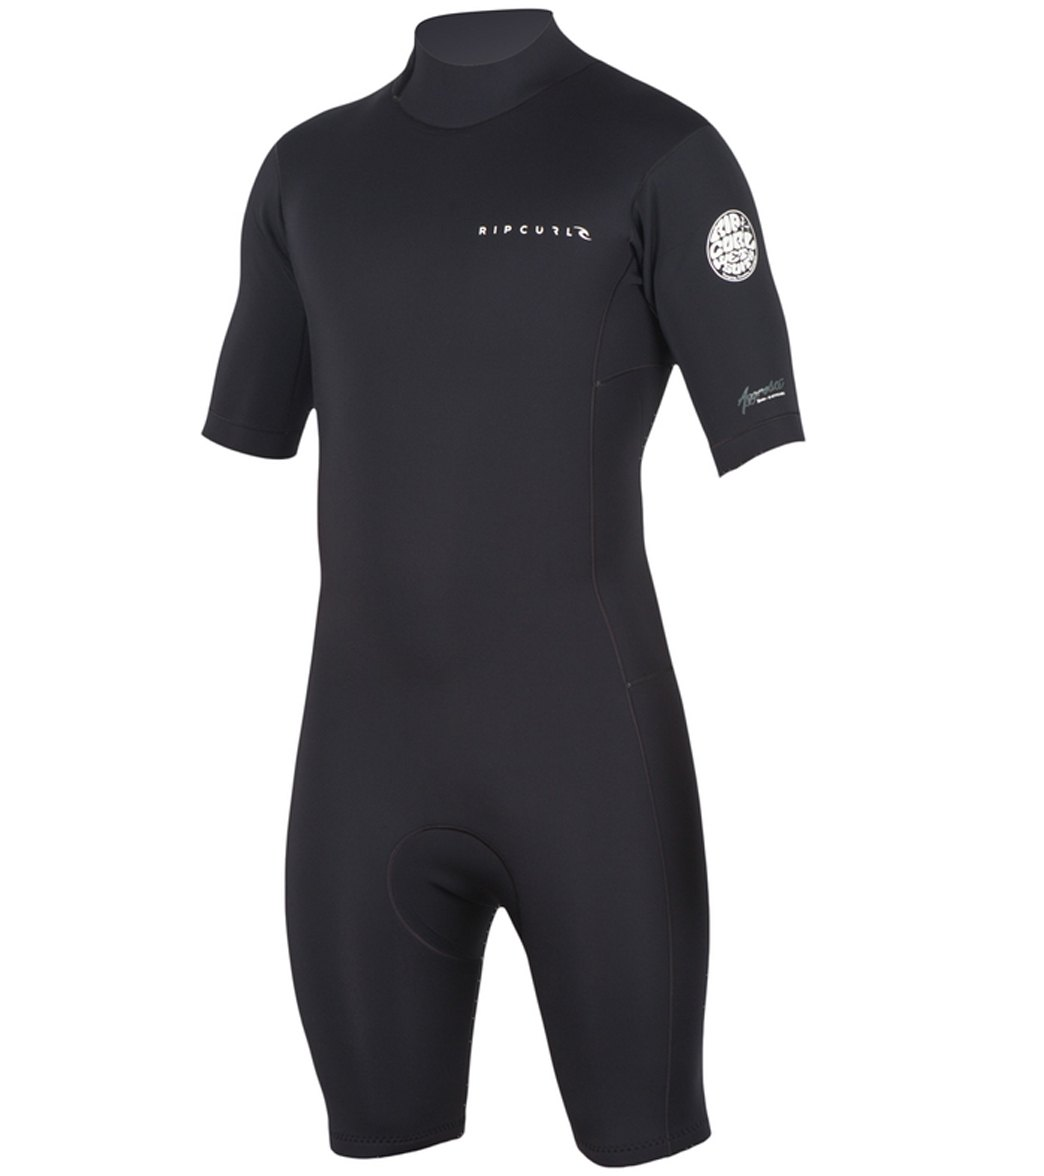 Rip Curl Men s 2 2mm Aggrolite Short Sleeve Back Zip Spring Suit Wetsuit 3c8f69a17